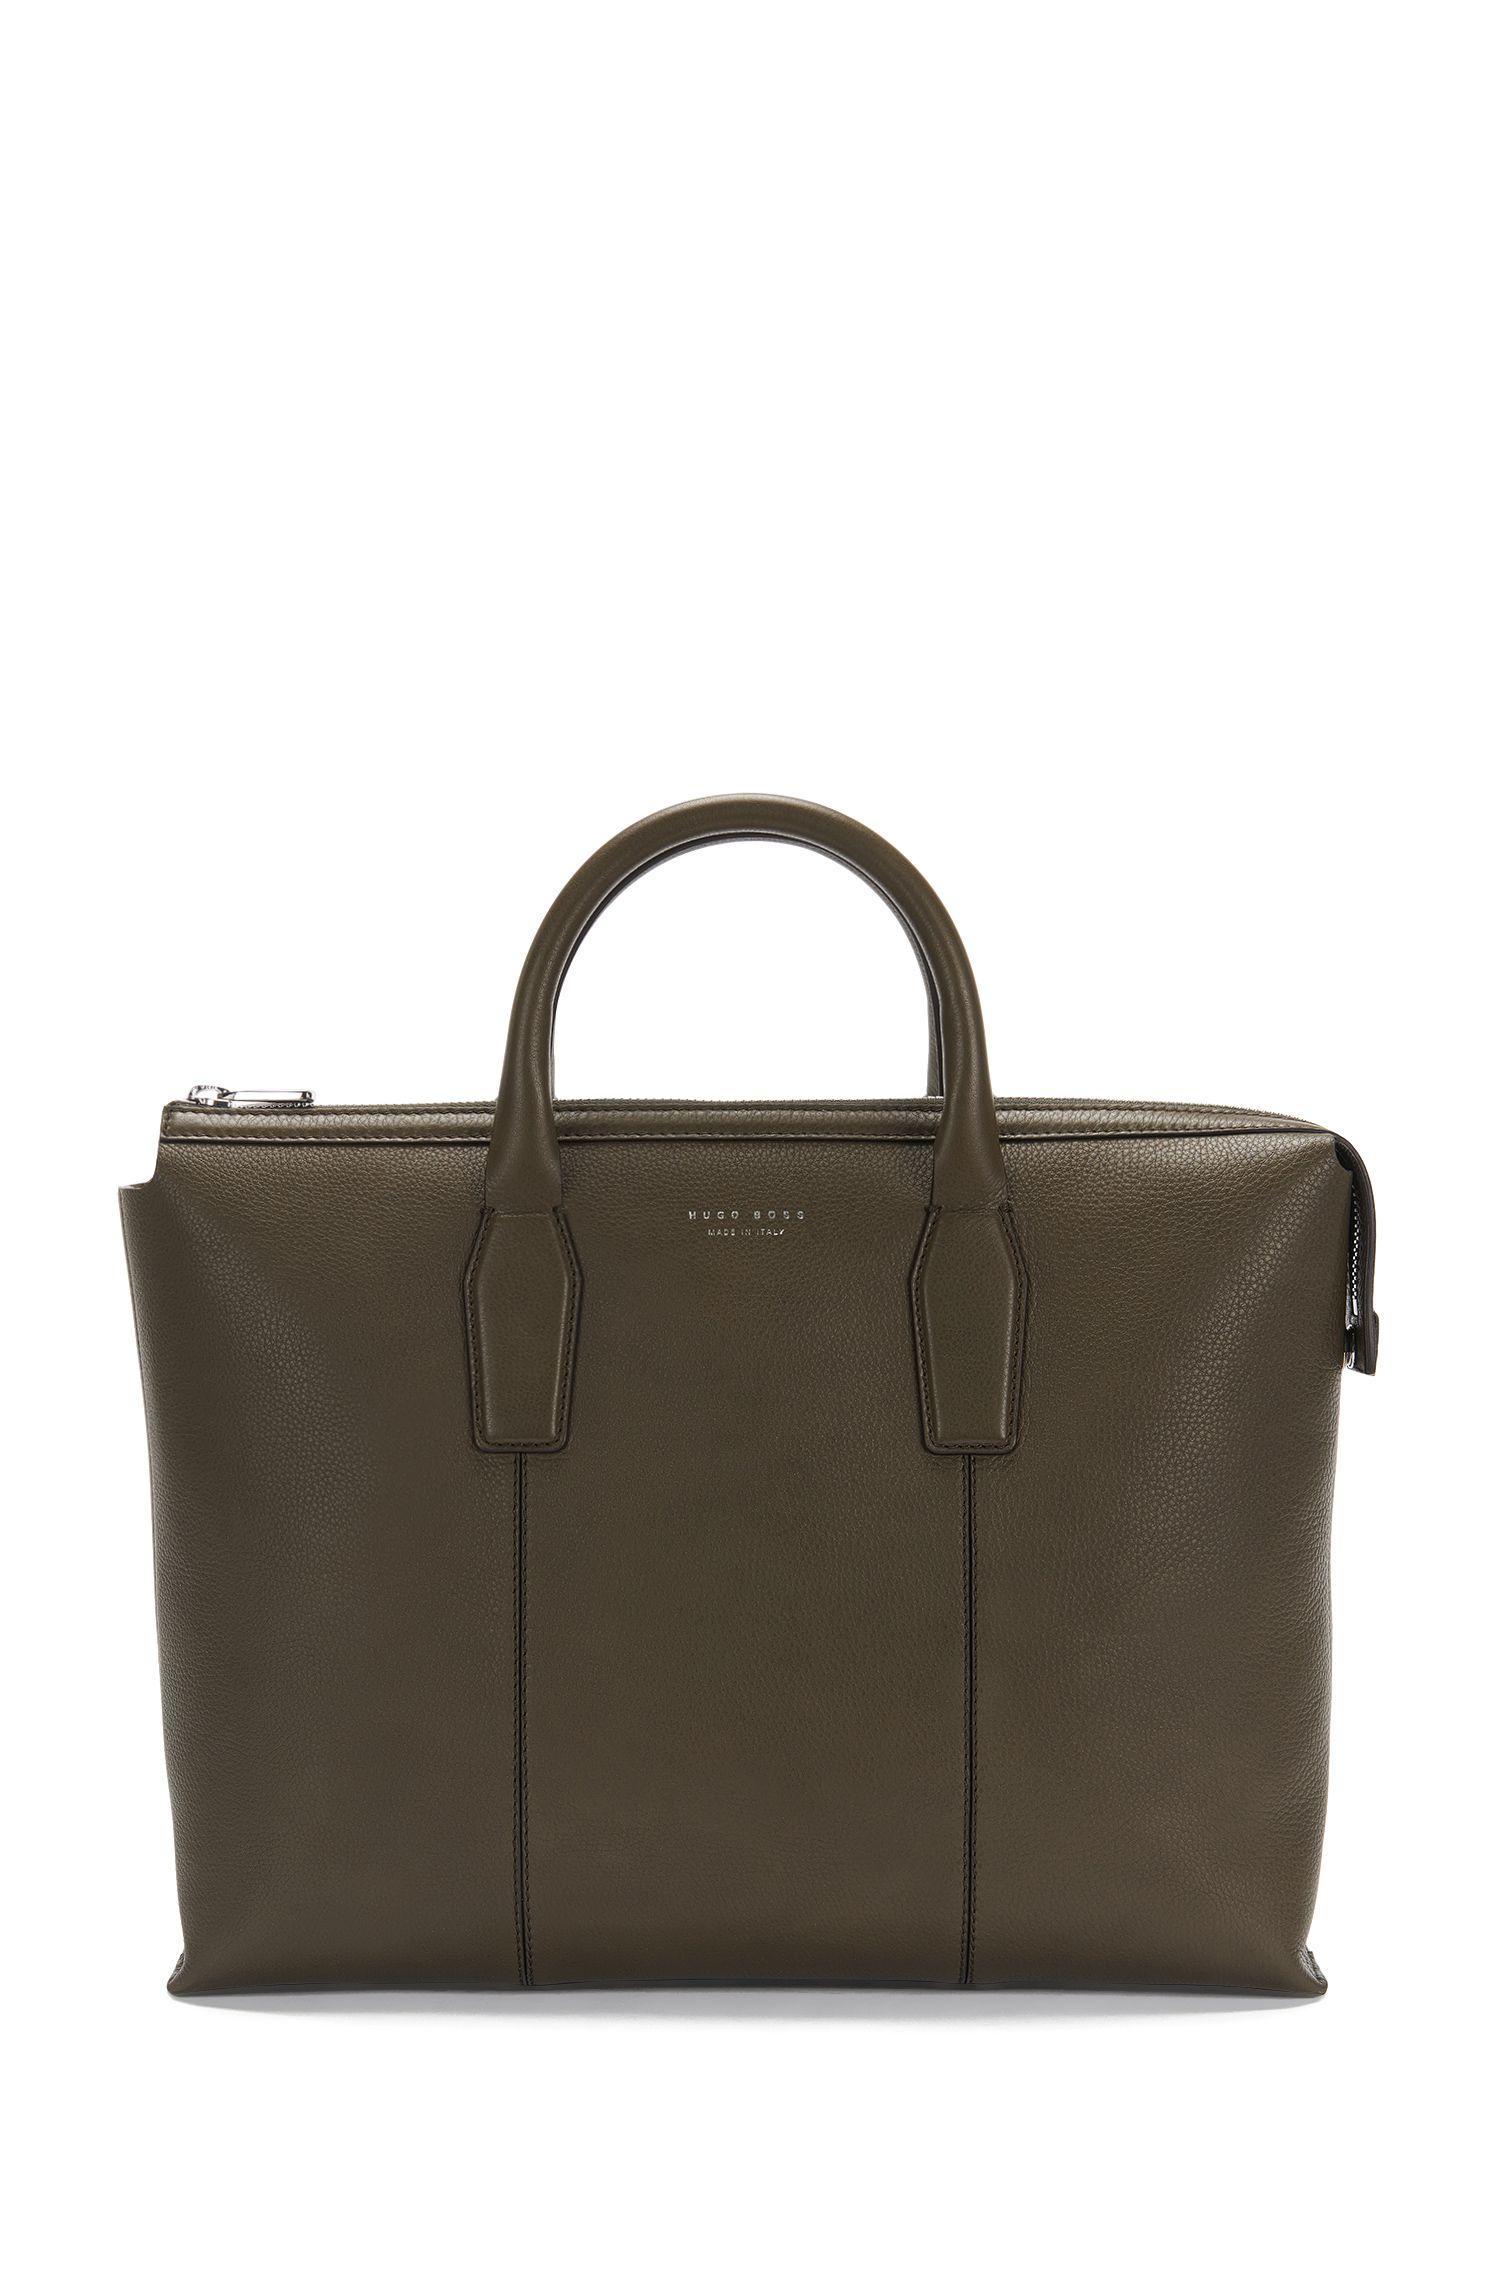 'Elite S Doc' | Italian Calfskin Workbag, Detachable Shoulder Strap